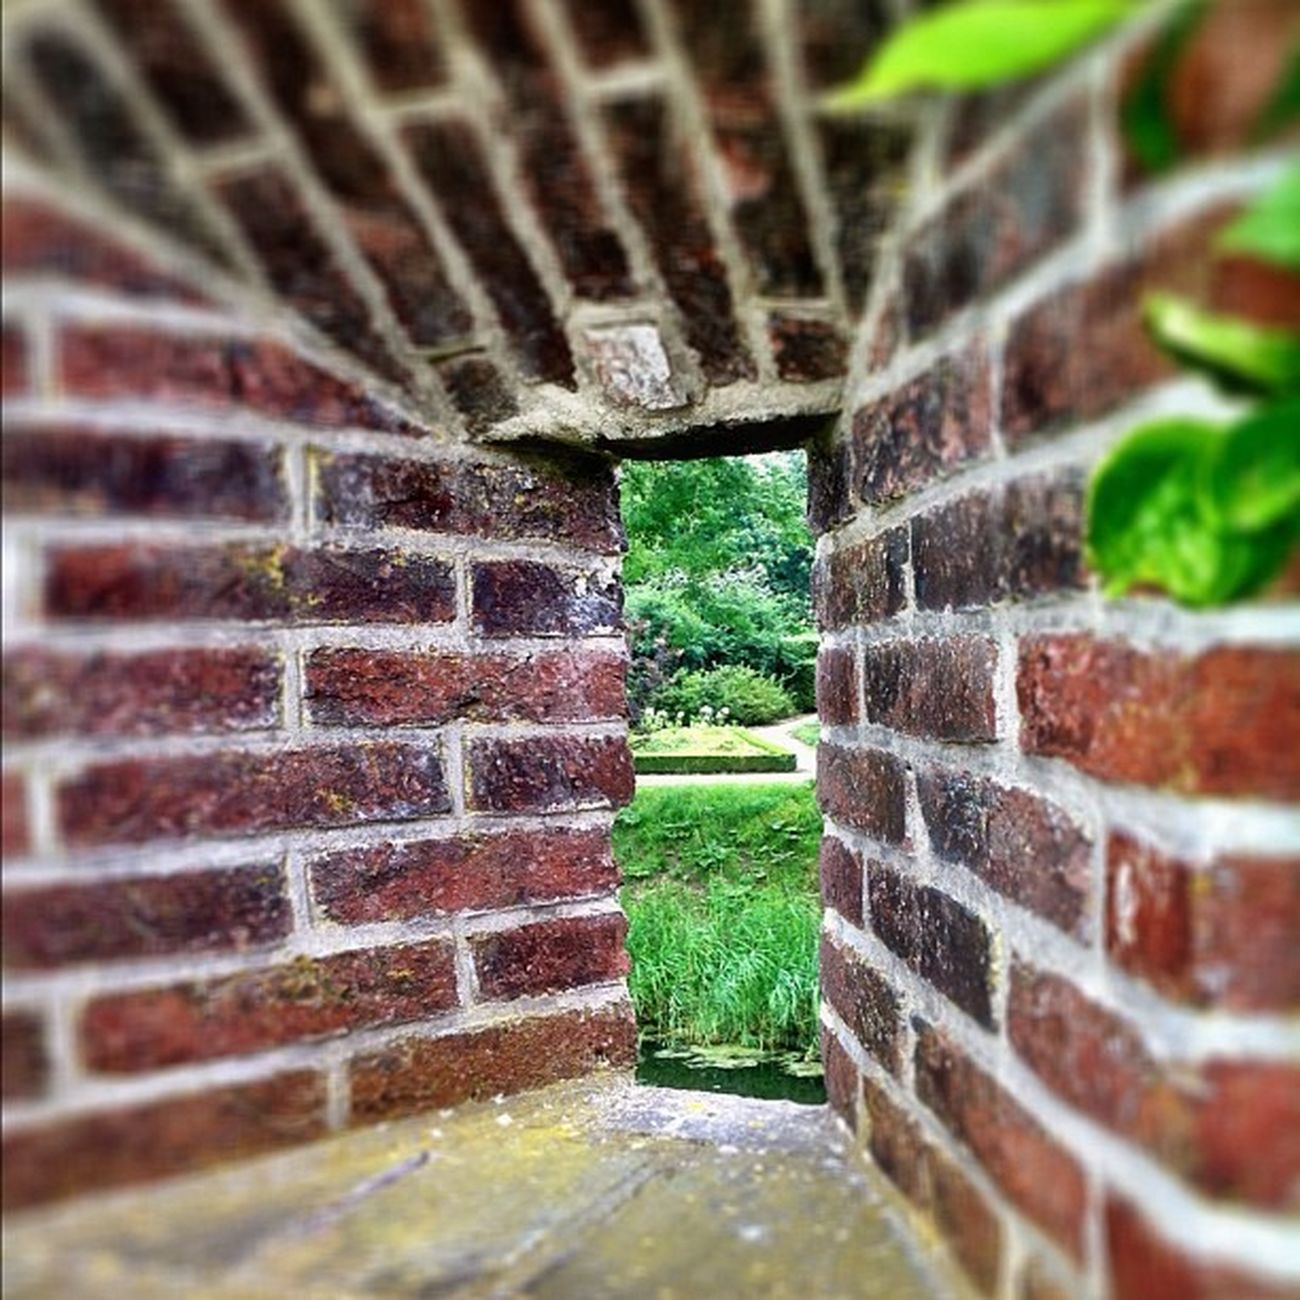 #window #windows #windowsonwindows #castle #simplistic #bricklovers #minimal #minimalist #WindowShotWednesday #minimalove #minimalistics #minimalism #instaaaaah #igville #igville_decay #texture #texturama #texturextreme #urbex #urbexphotography #urbex Instaaaaah Urbexphotography Windows Igdungeon Minimal Detailsofdecay Window Royalsnappingartists Castle Igville Minimalism Simplistic Texture Urbexjunkies Urbex Urbanexploring Minimalove Instaxplore Minimalist Texturama Urbandecay Igville_decay Texturextreme Urbexers Filthyfeeds Windowsonwindows Windowshotwednesday Bricklovers Minimalistics